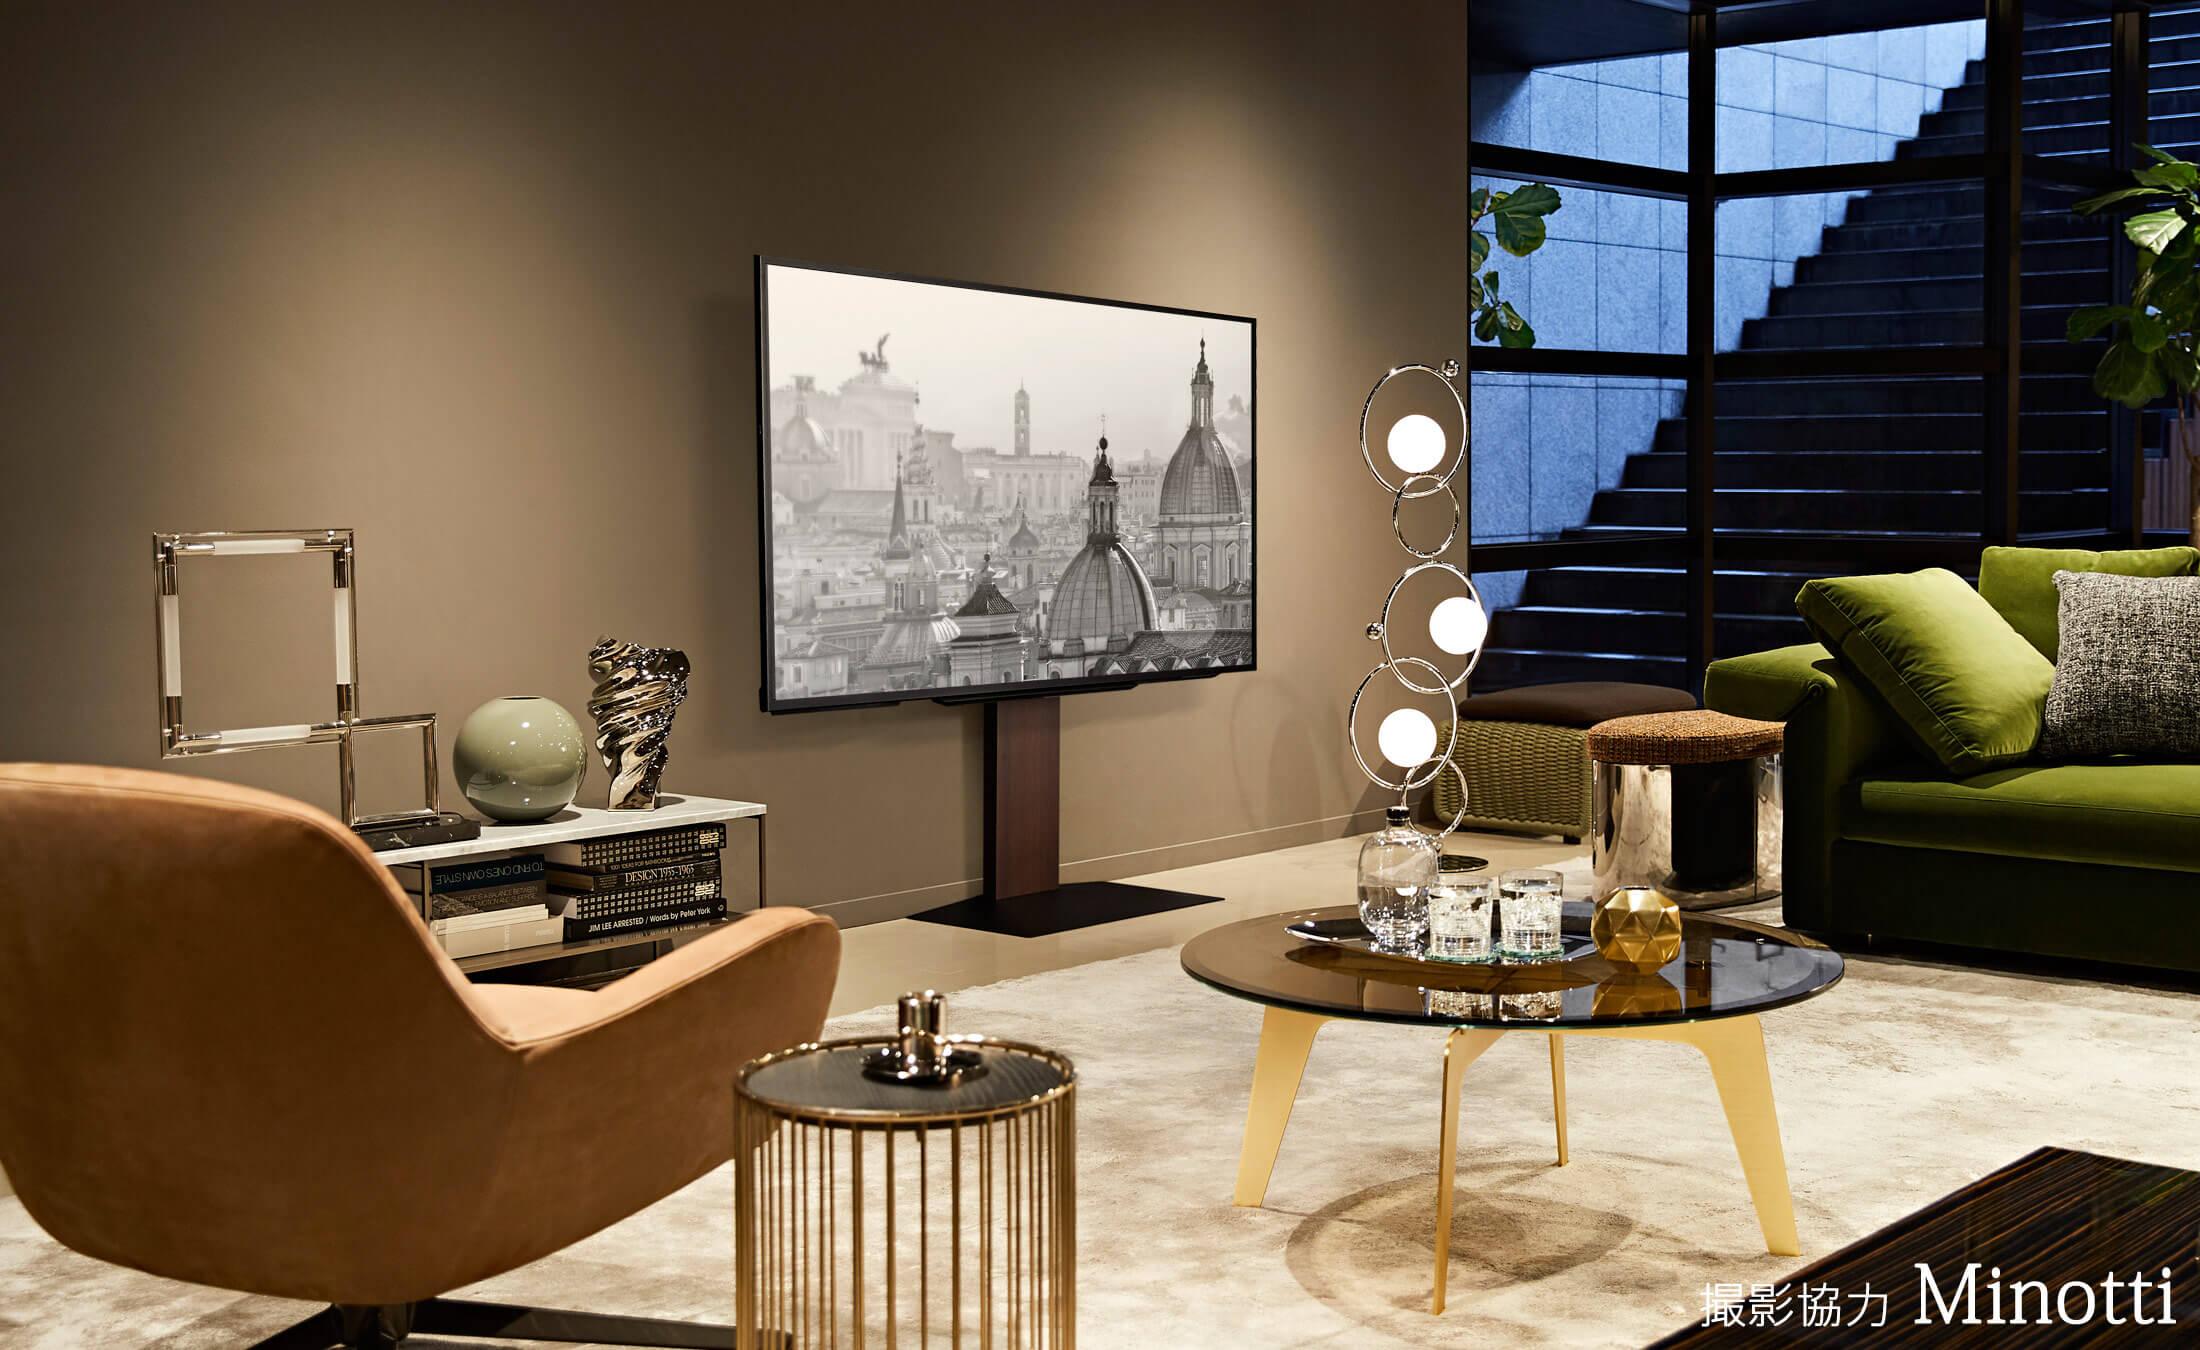 WALL INTERIOR TV STAND V3 壁寄せテレビスタンドV3 LIVING ROOM 3枚目